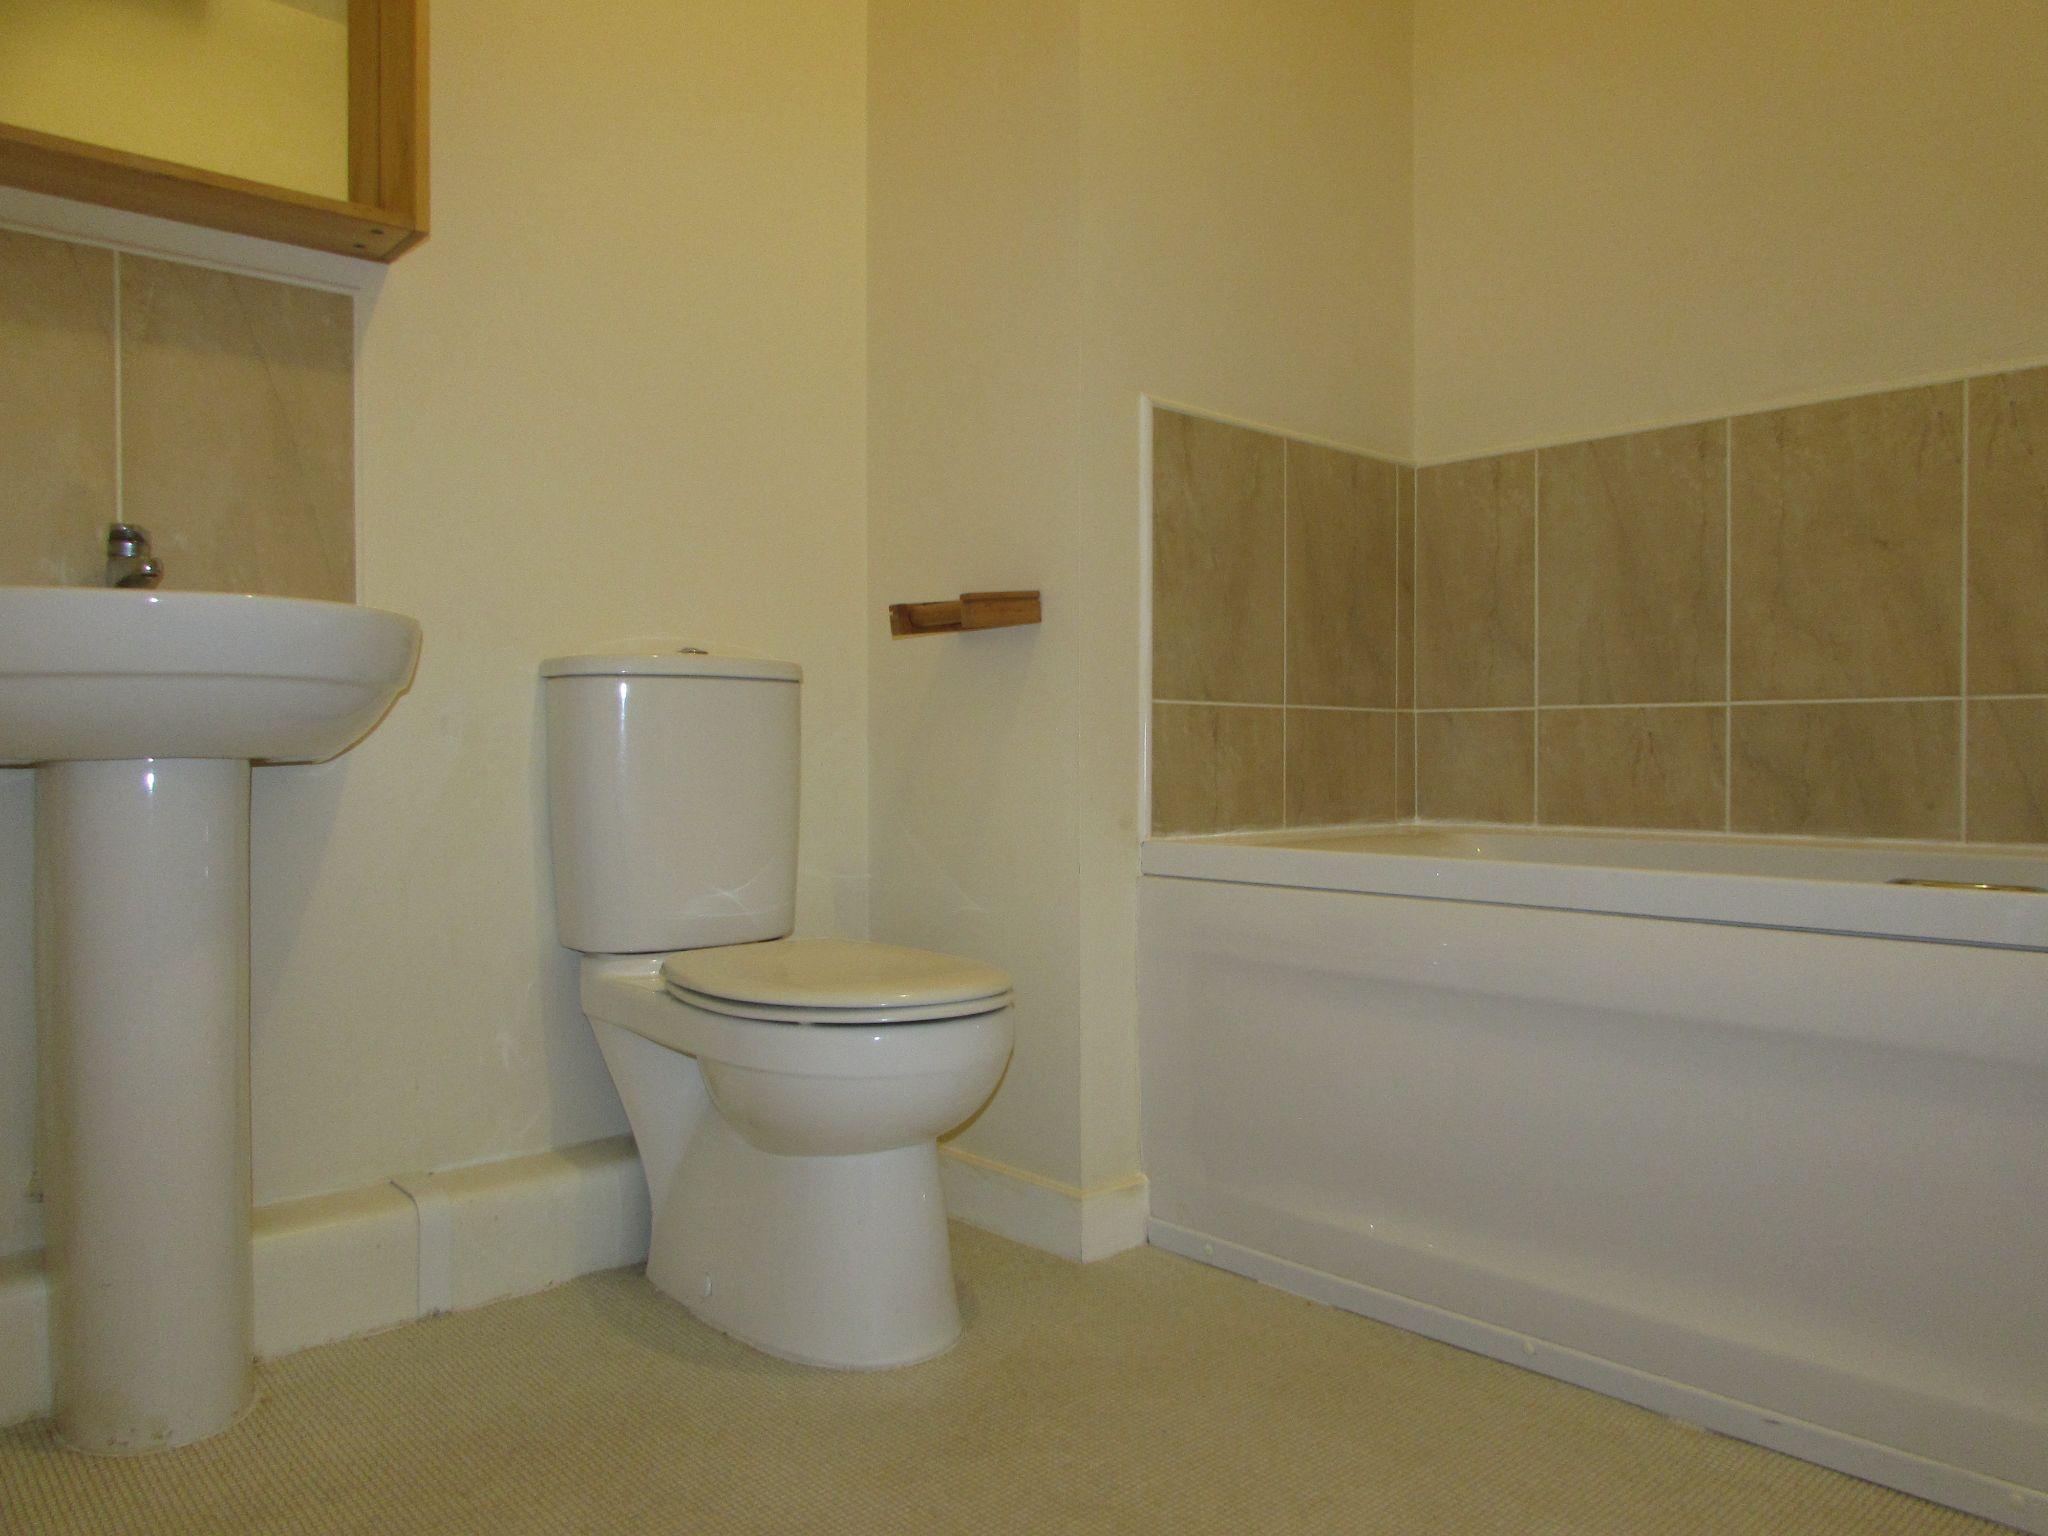 2 Bedroom Apartment Flat/apartment To Rent - Bathroom